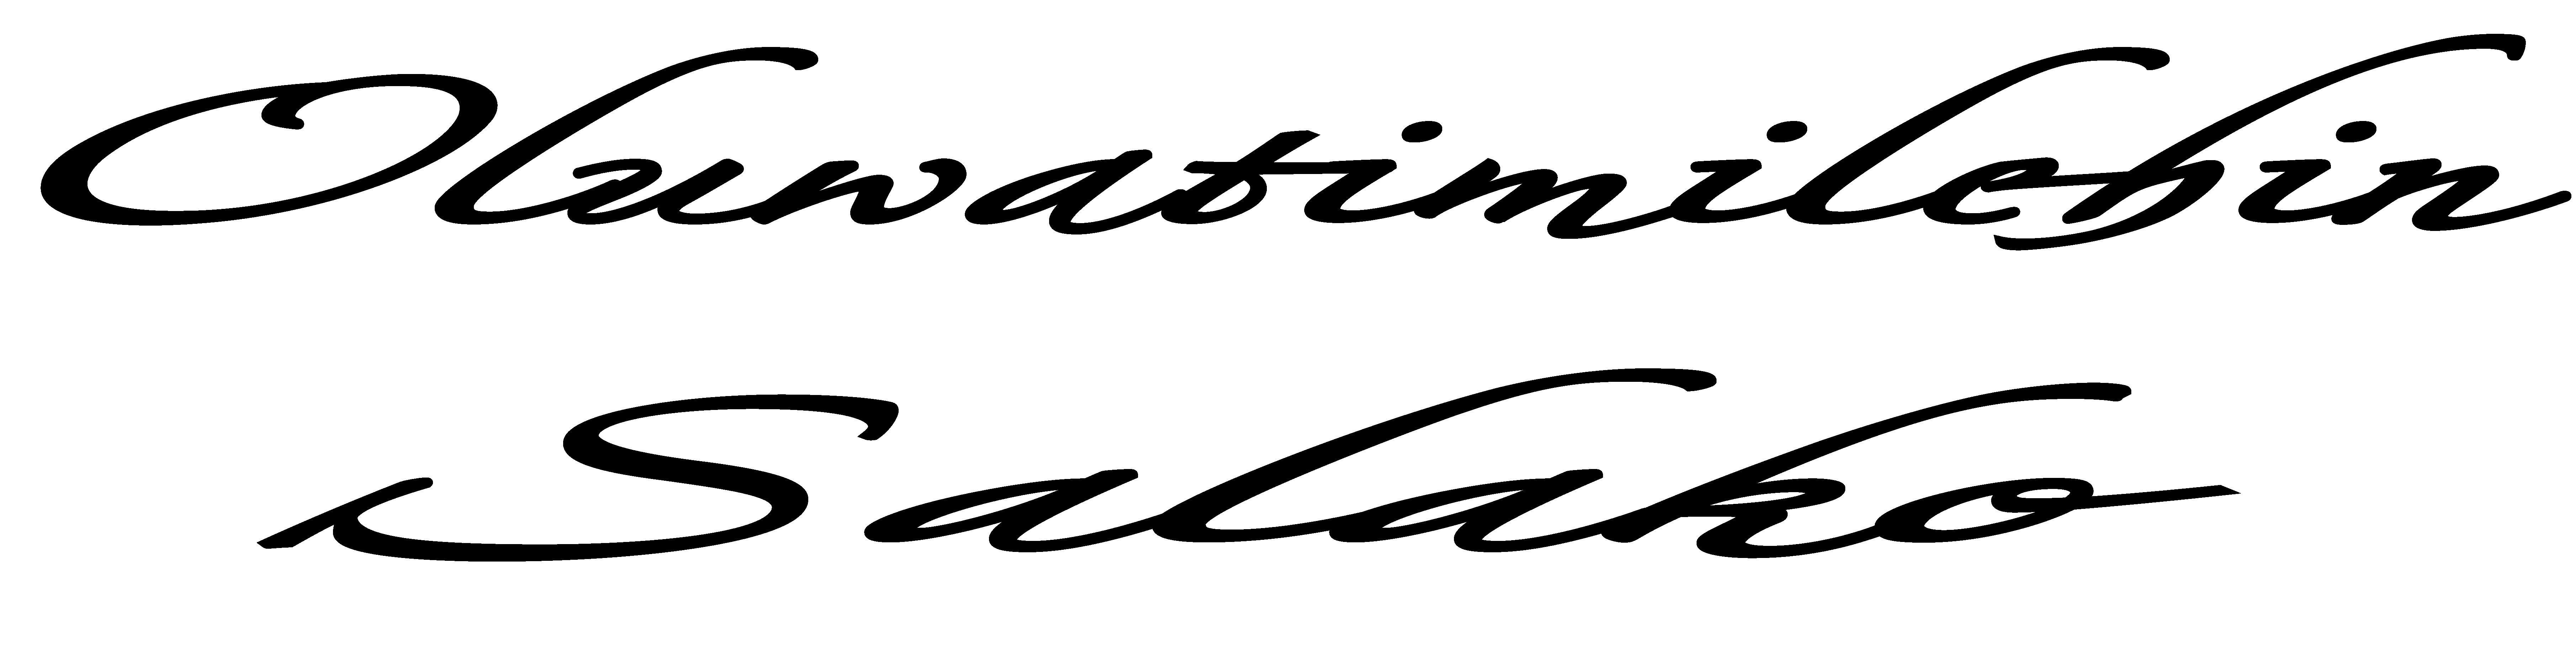 Oluwatimilehin Salako's Signature